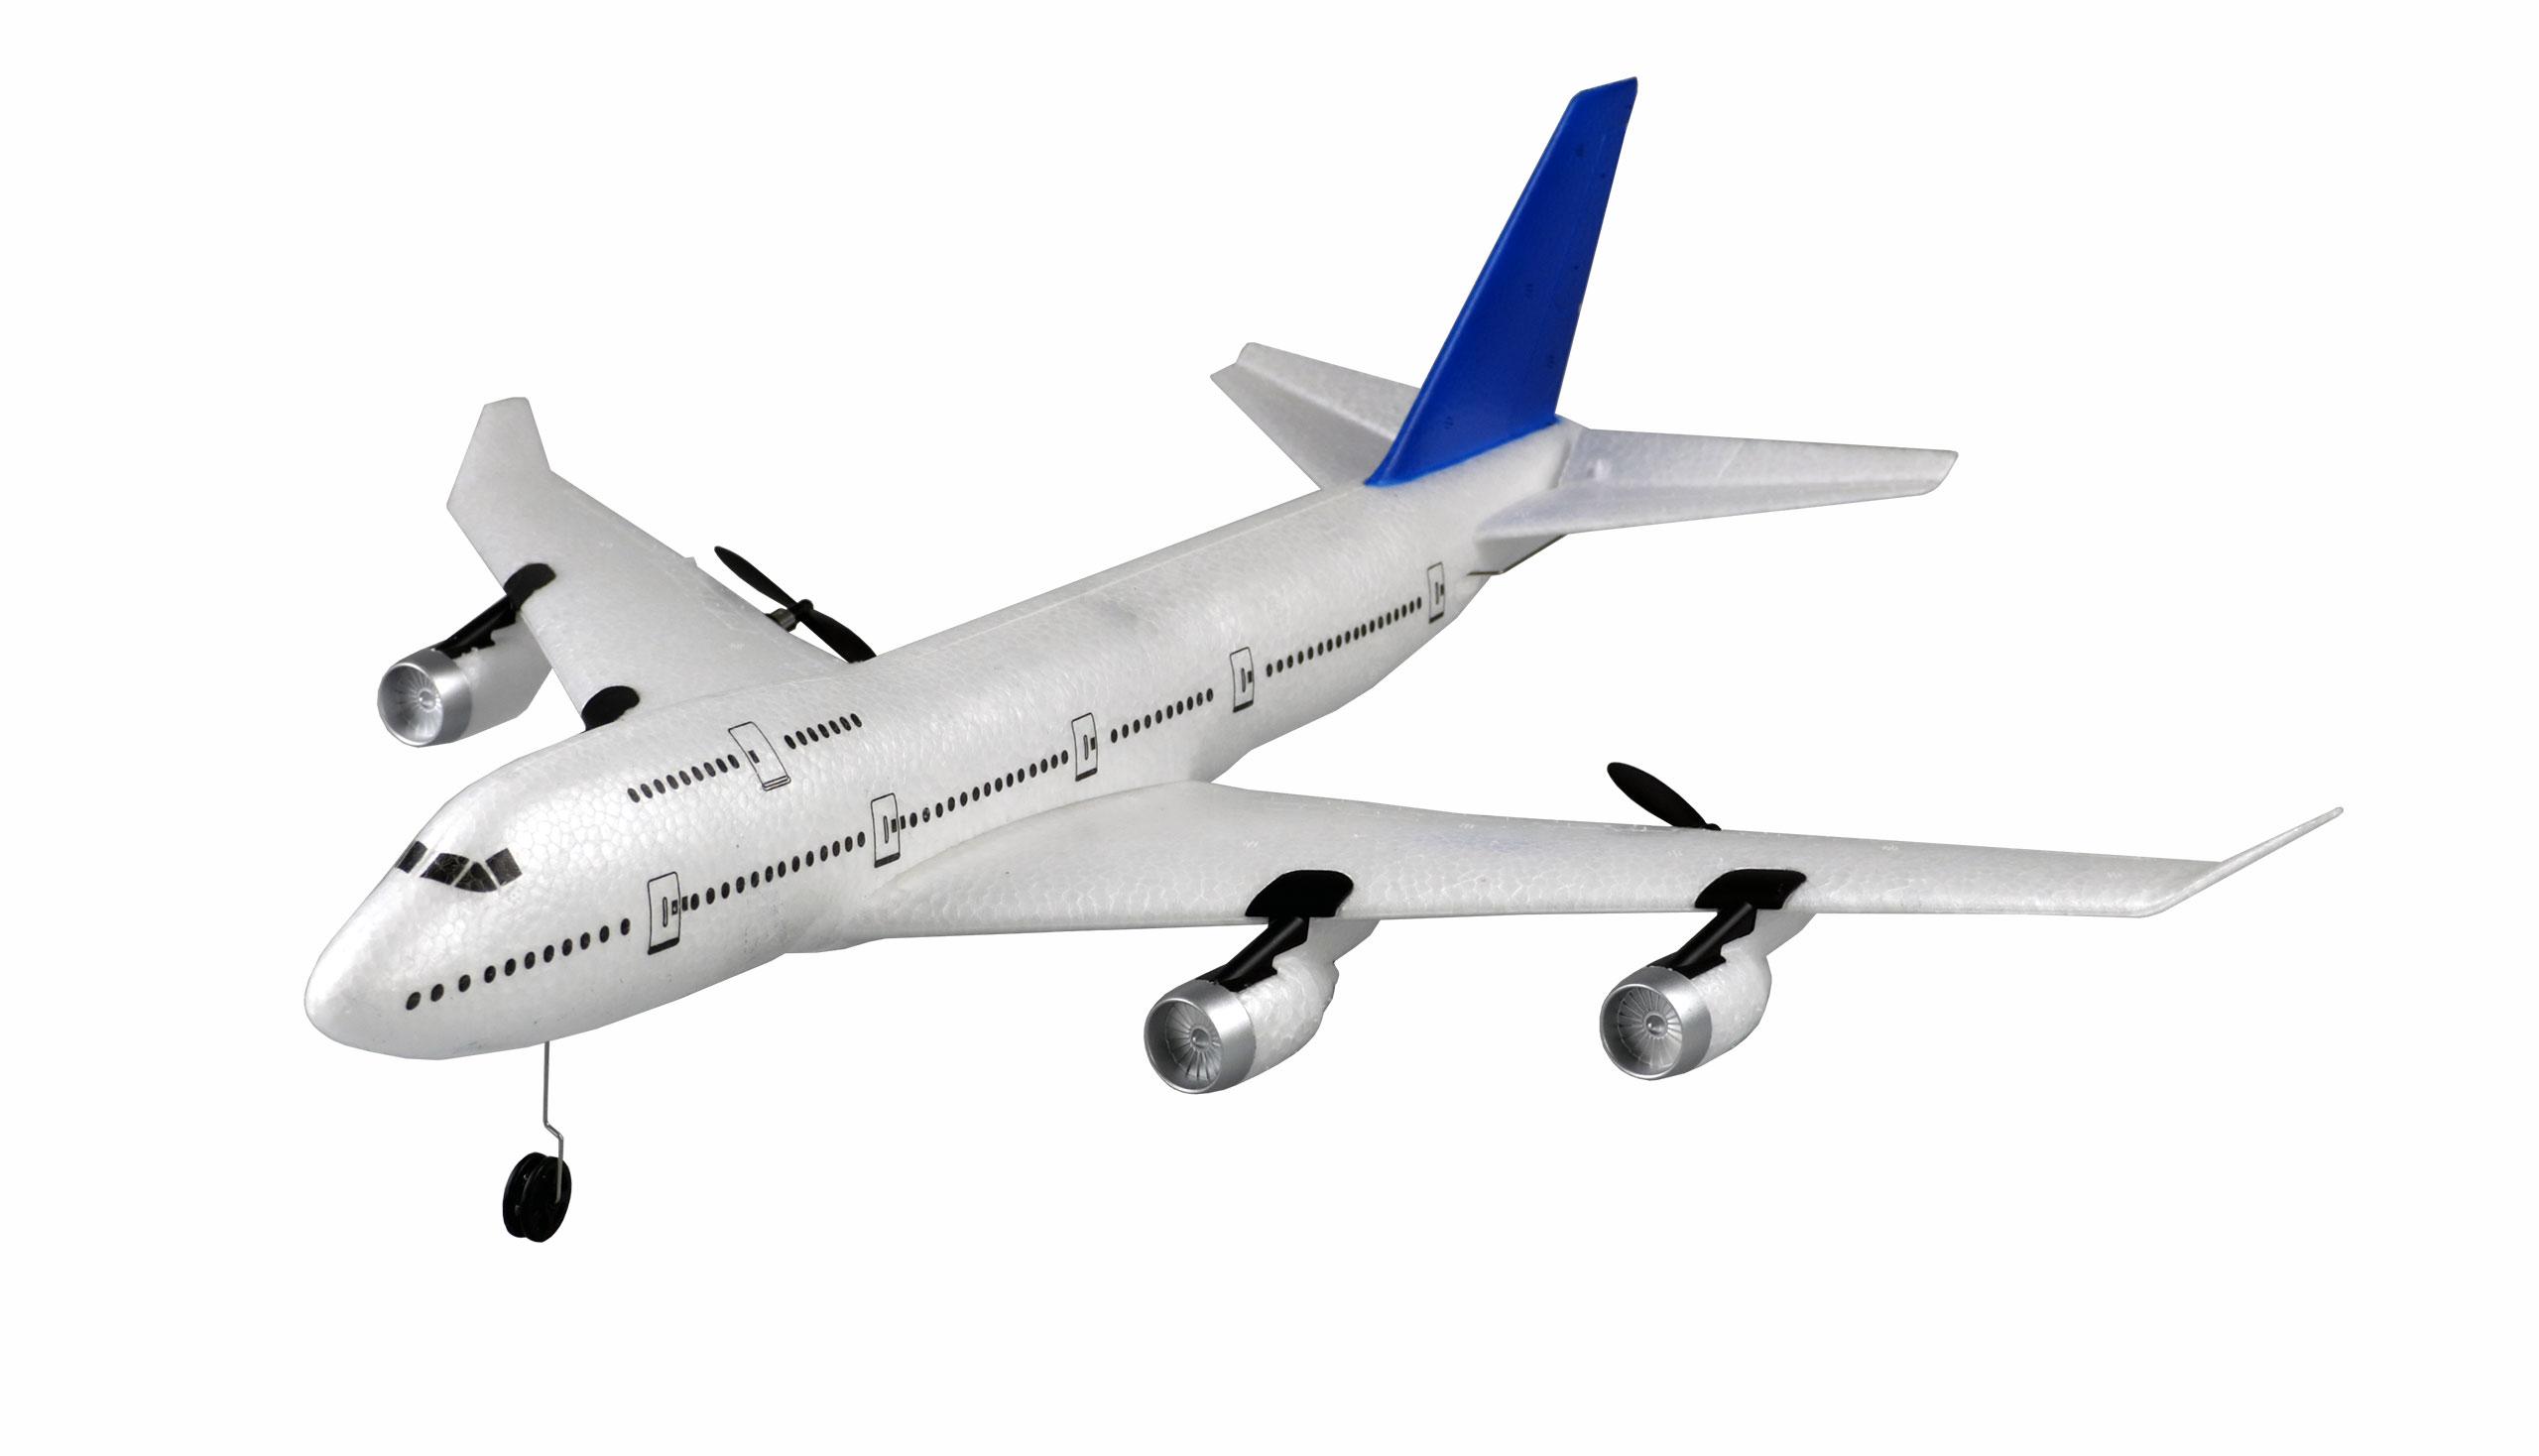 Amewi AMB74 - Funkgesteuertes (RC) Flugzeug - Flugbereit (RTF) - Blau - Weiß - Elektromotor - Junge/Mädchen - 14 Jahr(e)